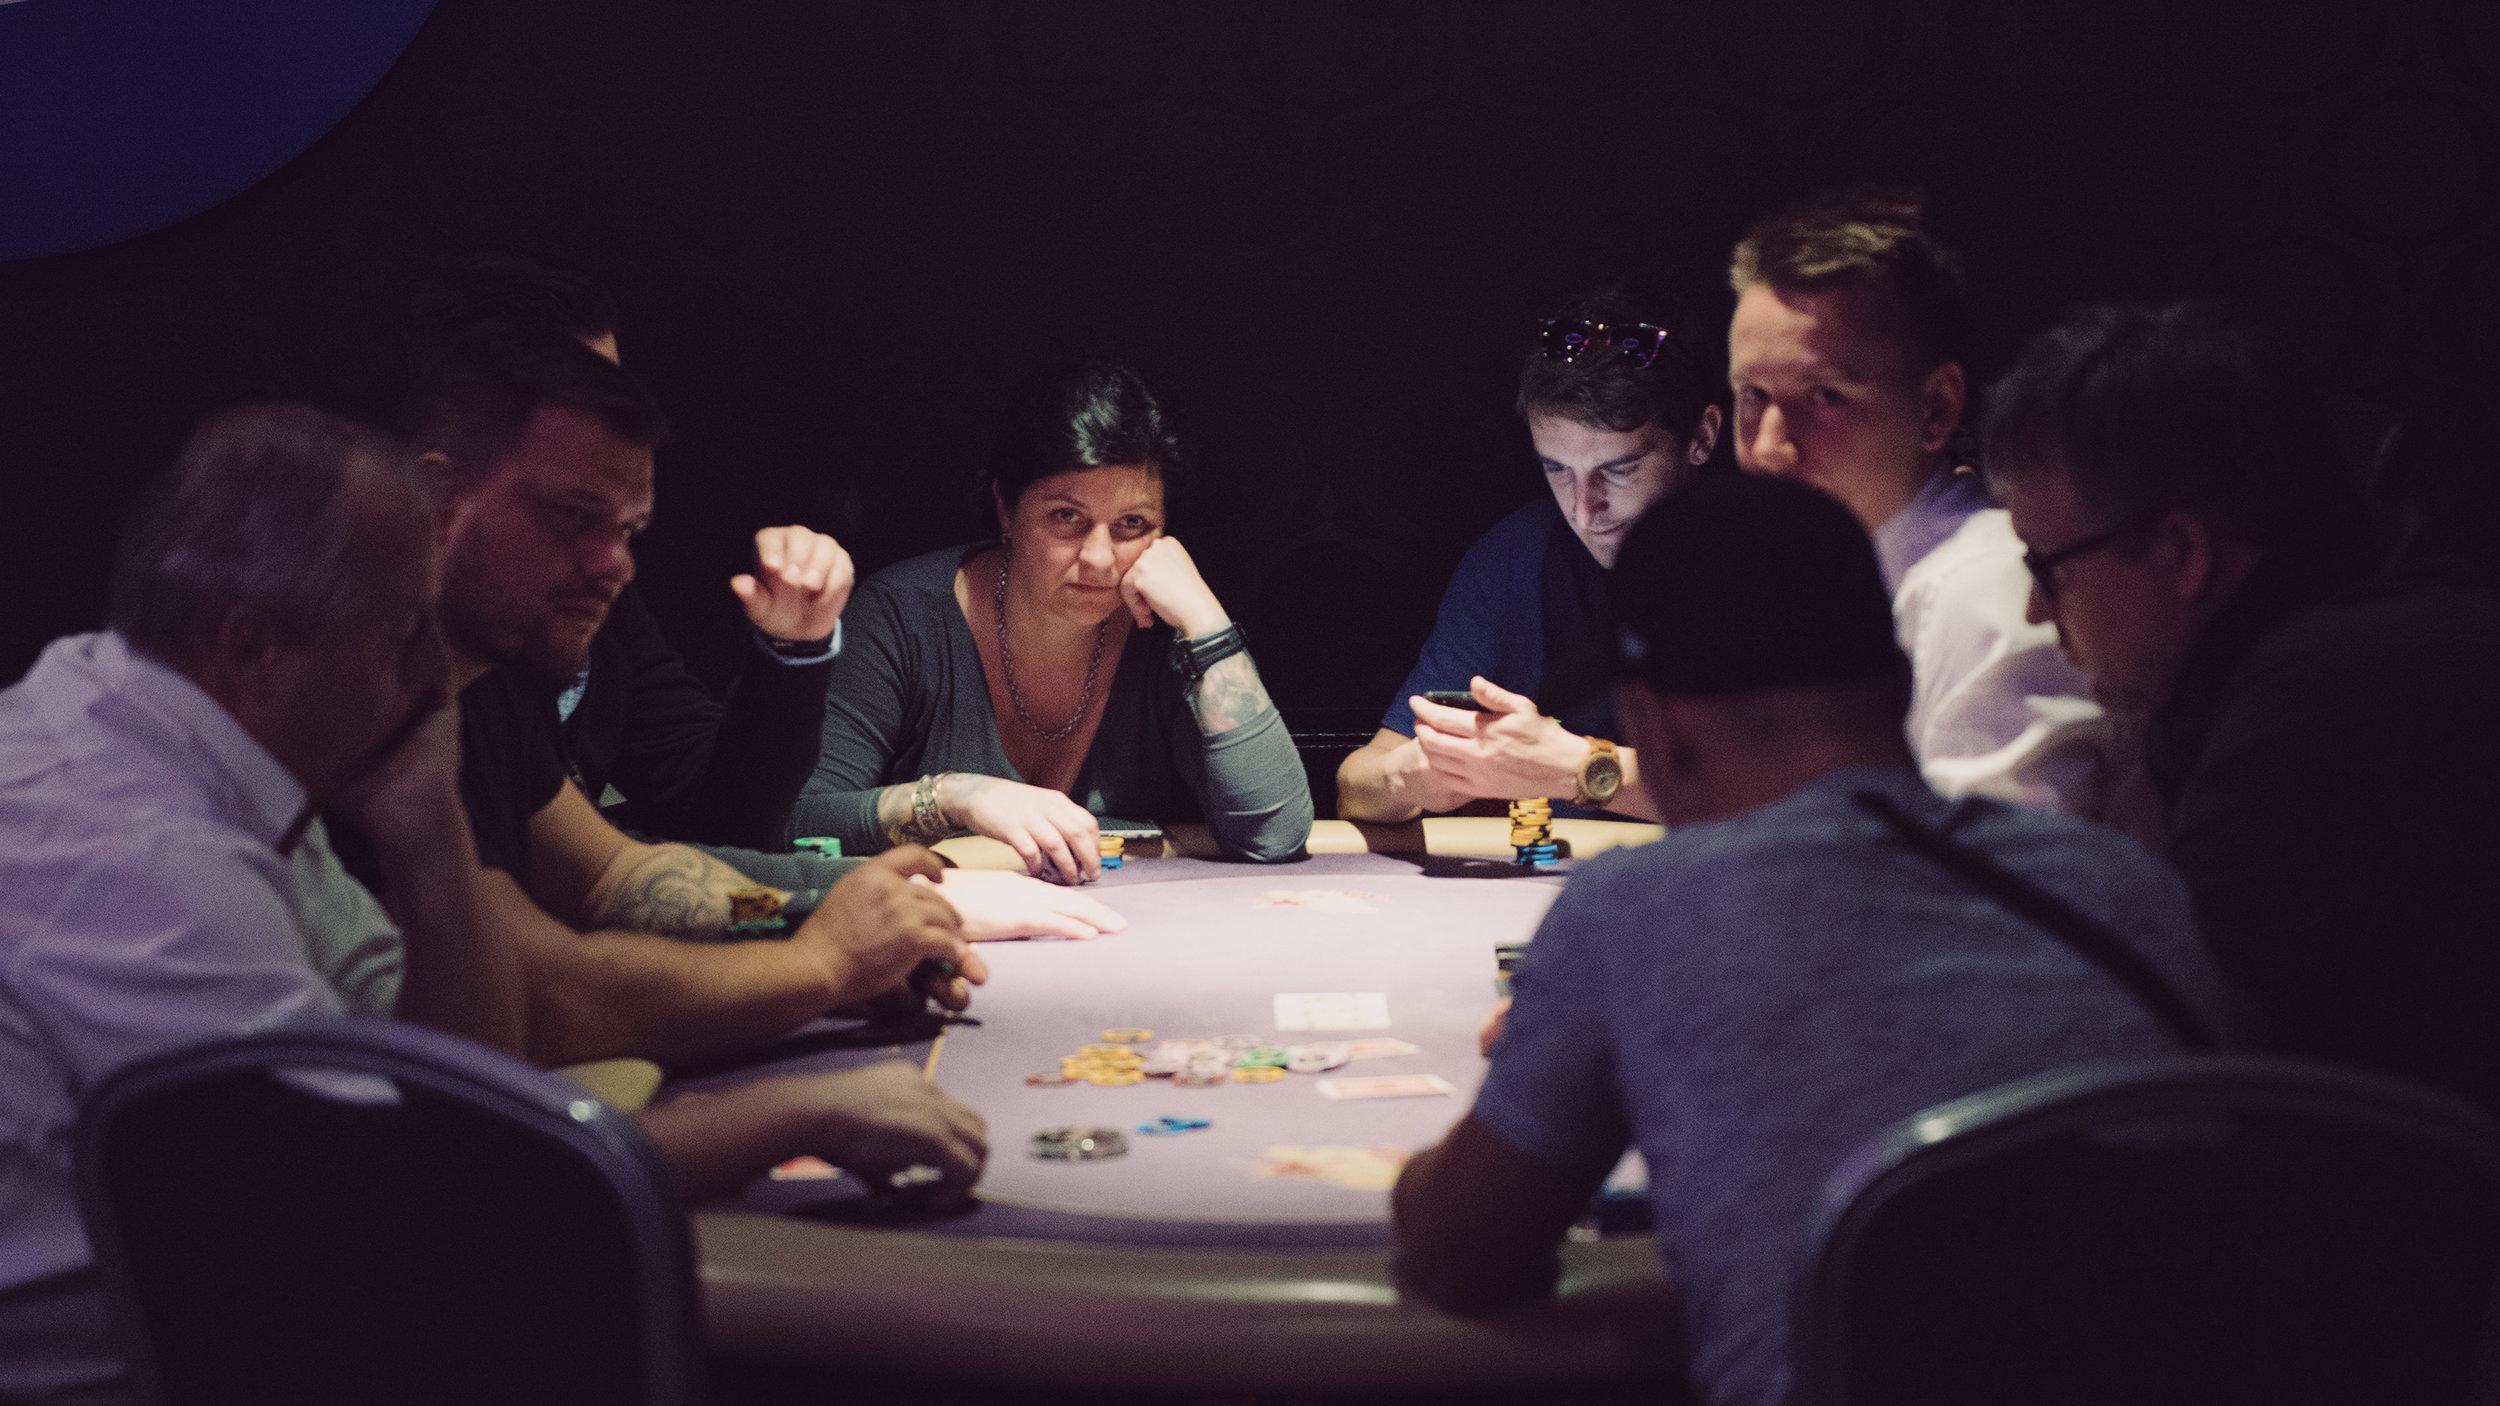 Poker-Photography-Europe-Polina-Shubkina-Casino-RebuyStars-003.JPG